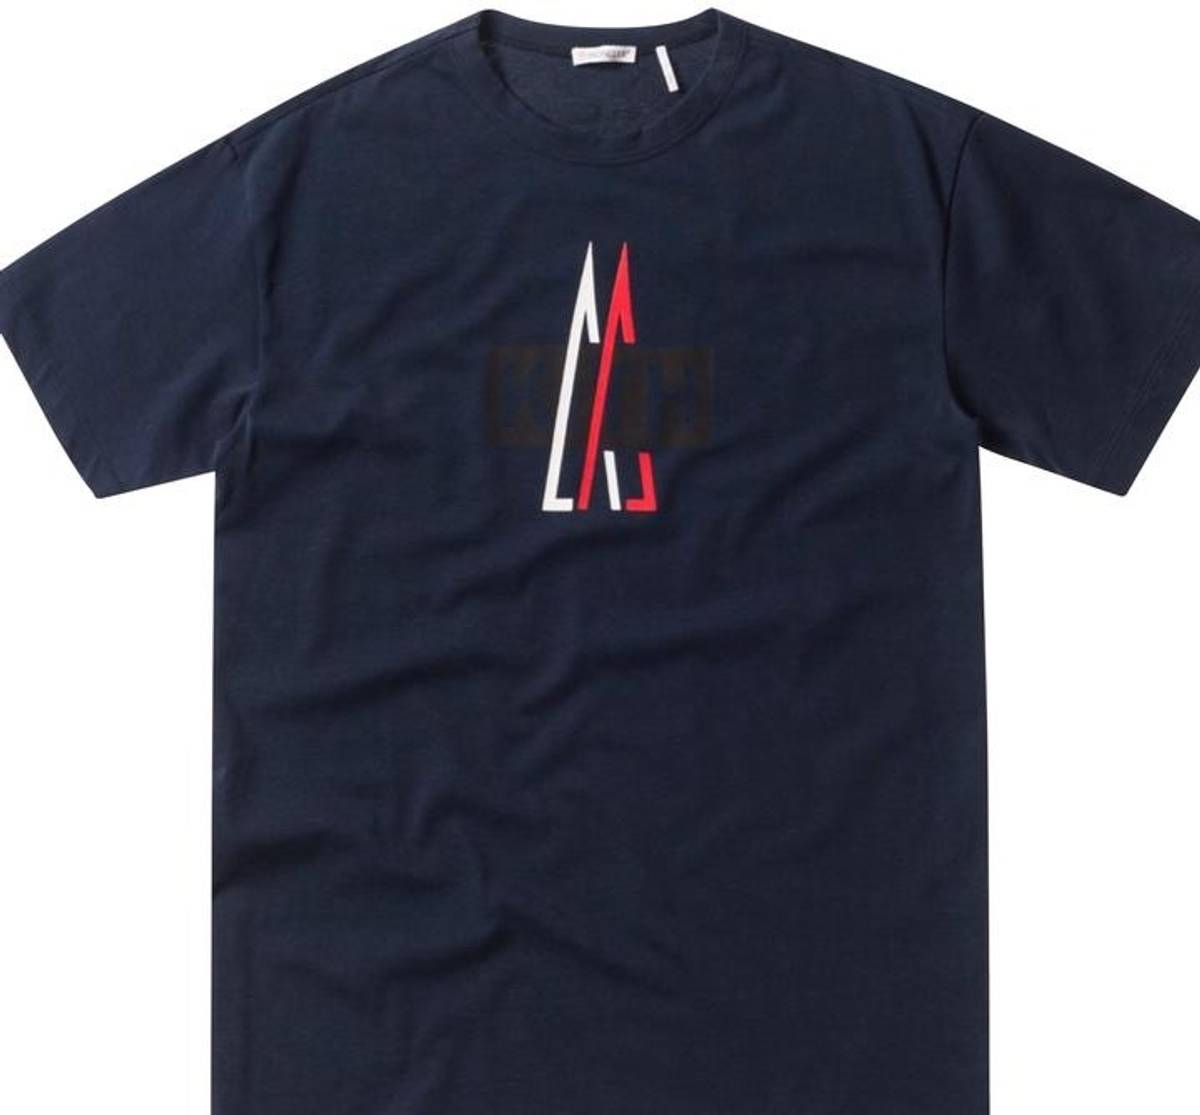 5b5871bfd4ca Moncler Kith X Moncler Navy T-Shirt Size m - Short Sleeve T-Shirts ...